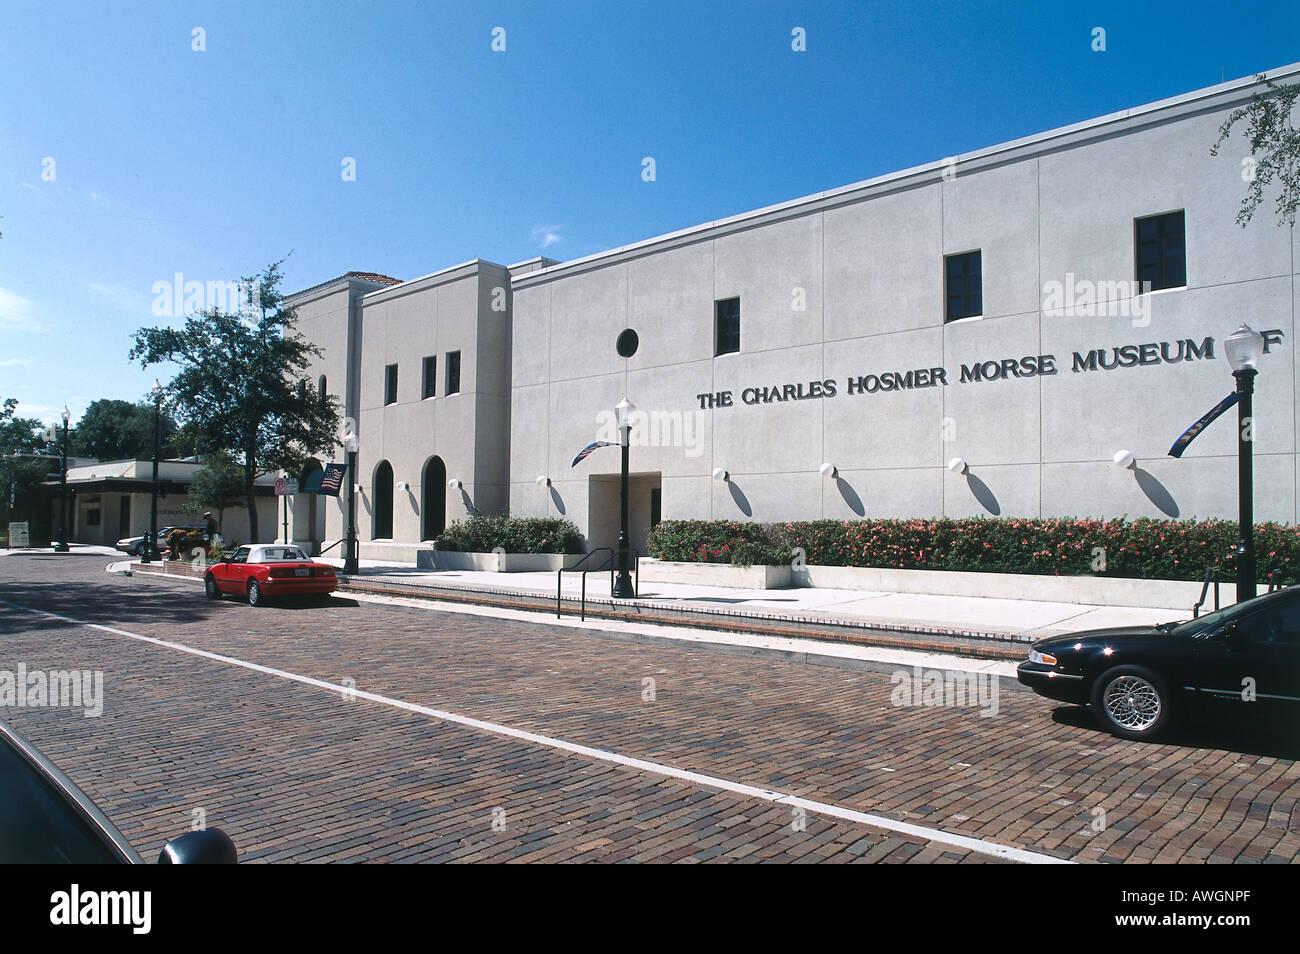 USA, Florida, Orlando, North Park Avenue, Charles Hosmer Morse Museum of American Art - Stock Image